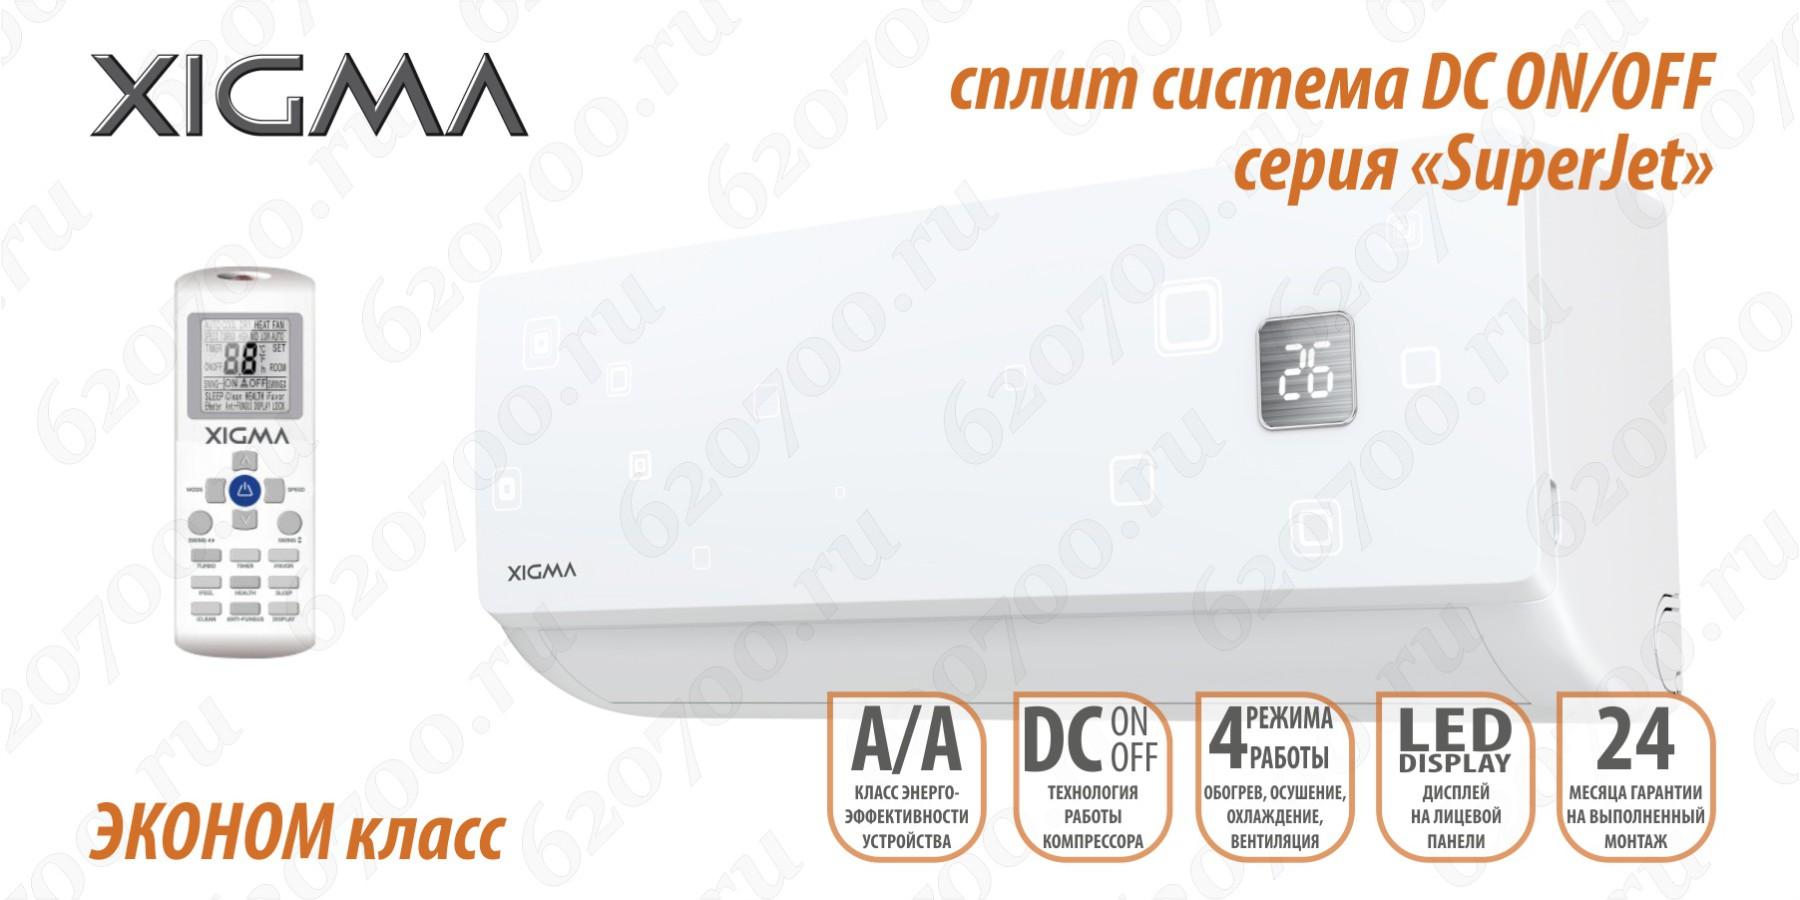 Кондиционер XIGMA XG-SJ77RHA-IDU/ ODU